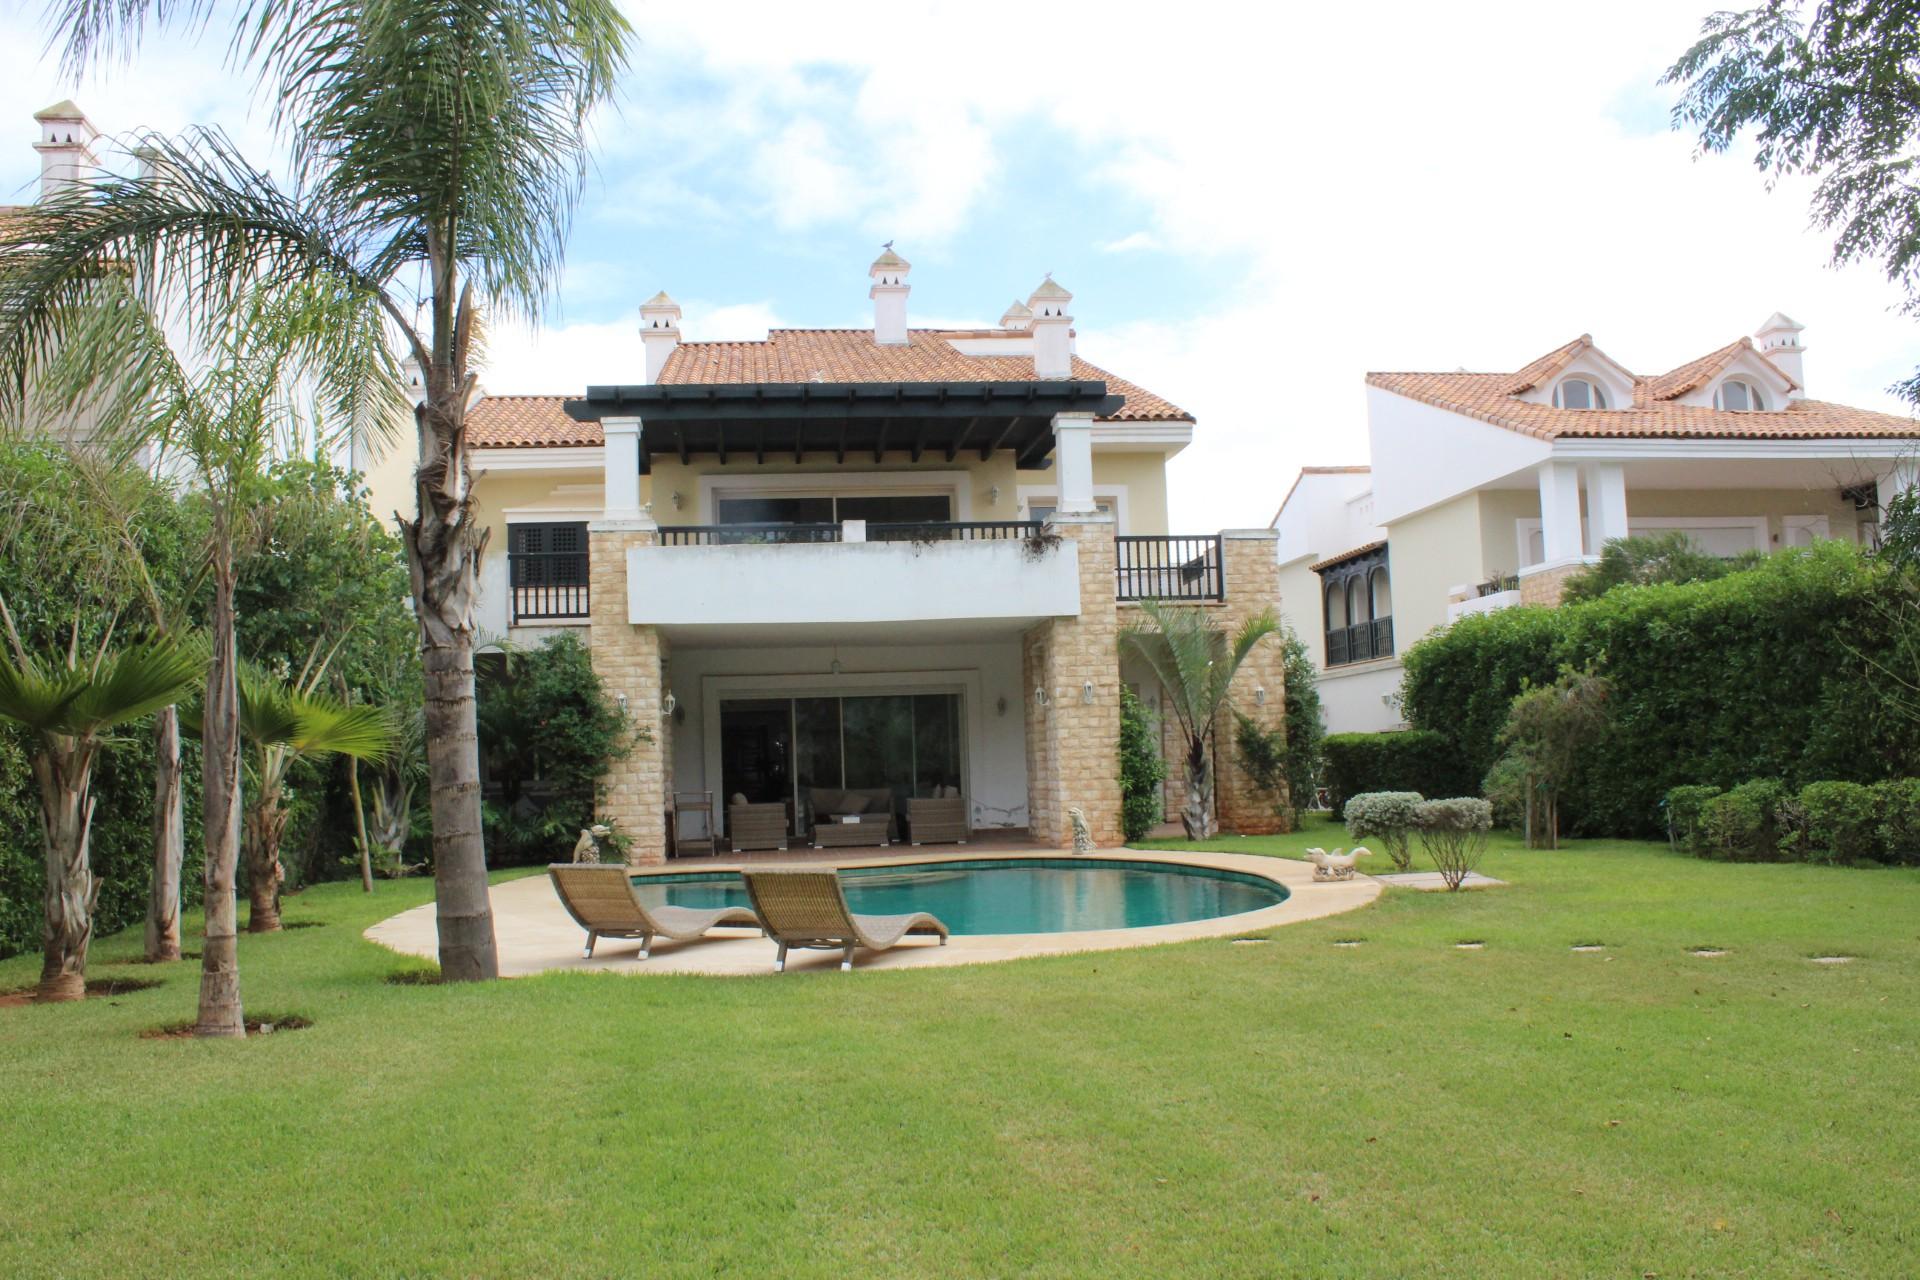 Maroc, Grand Casablanca, Dar bouazza à louer villa de maître meublée subtilement agencée 7 chambres